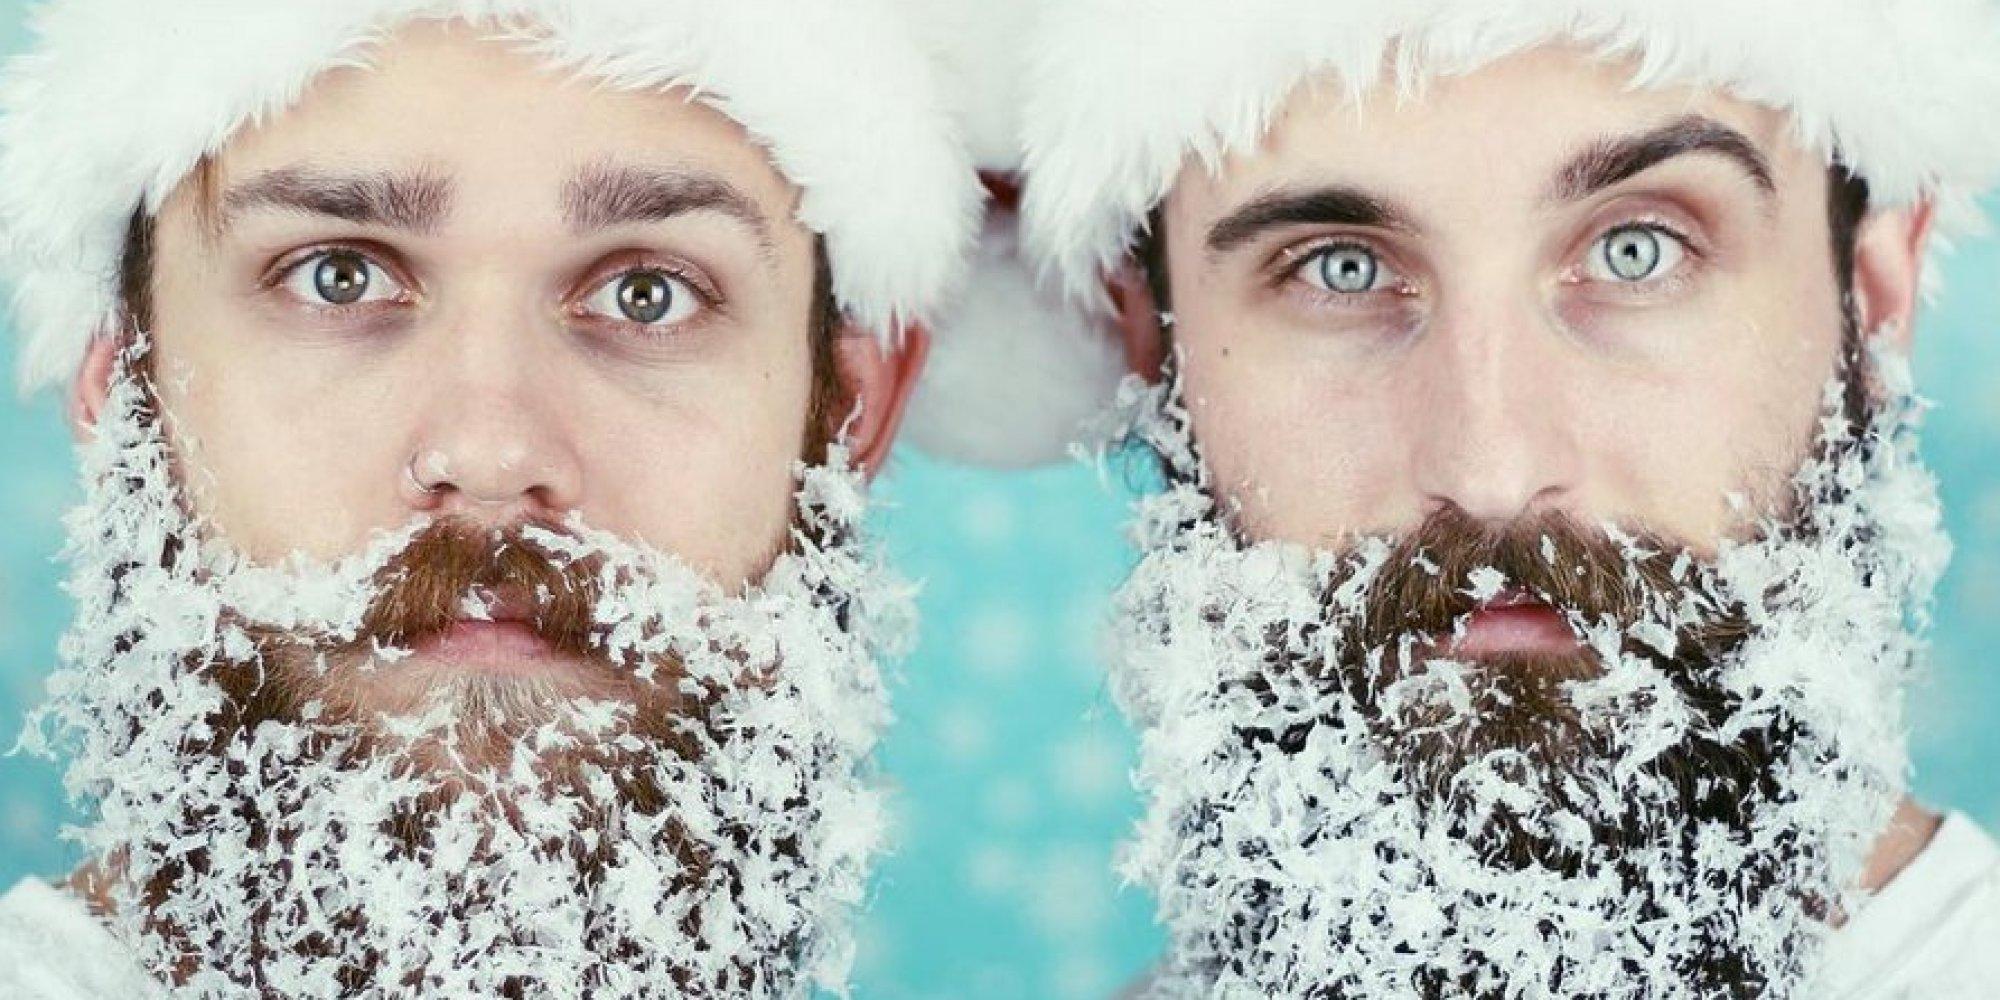 Festive Beard Art From Glitter To Tinsel The 12 Beards